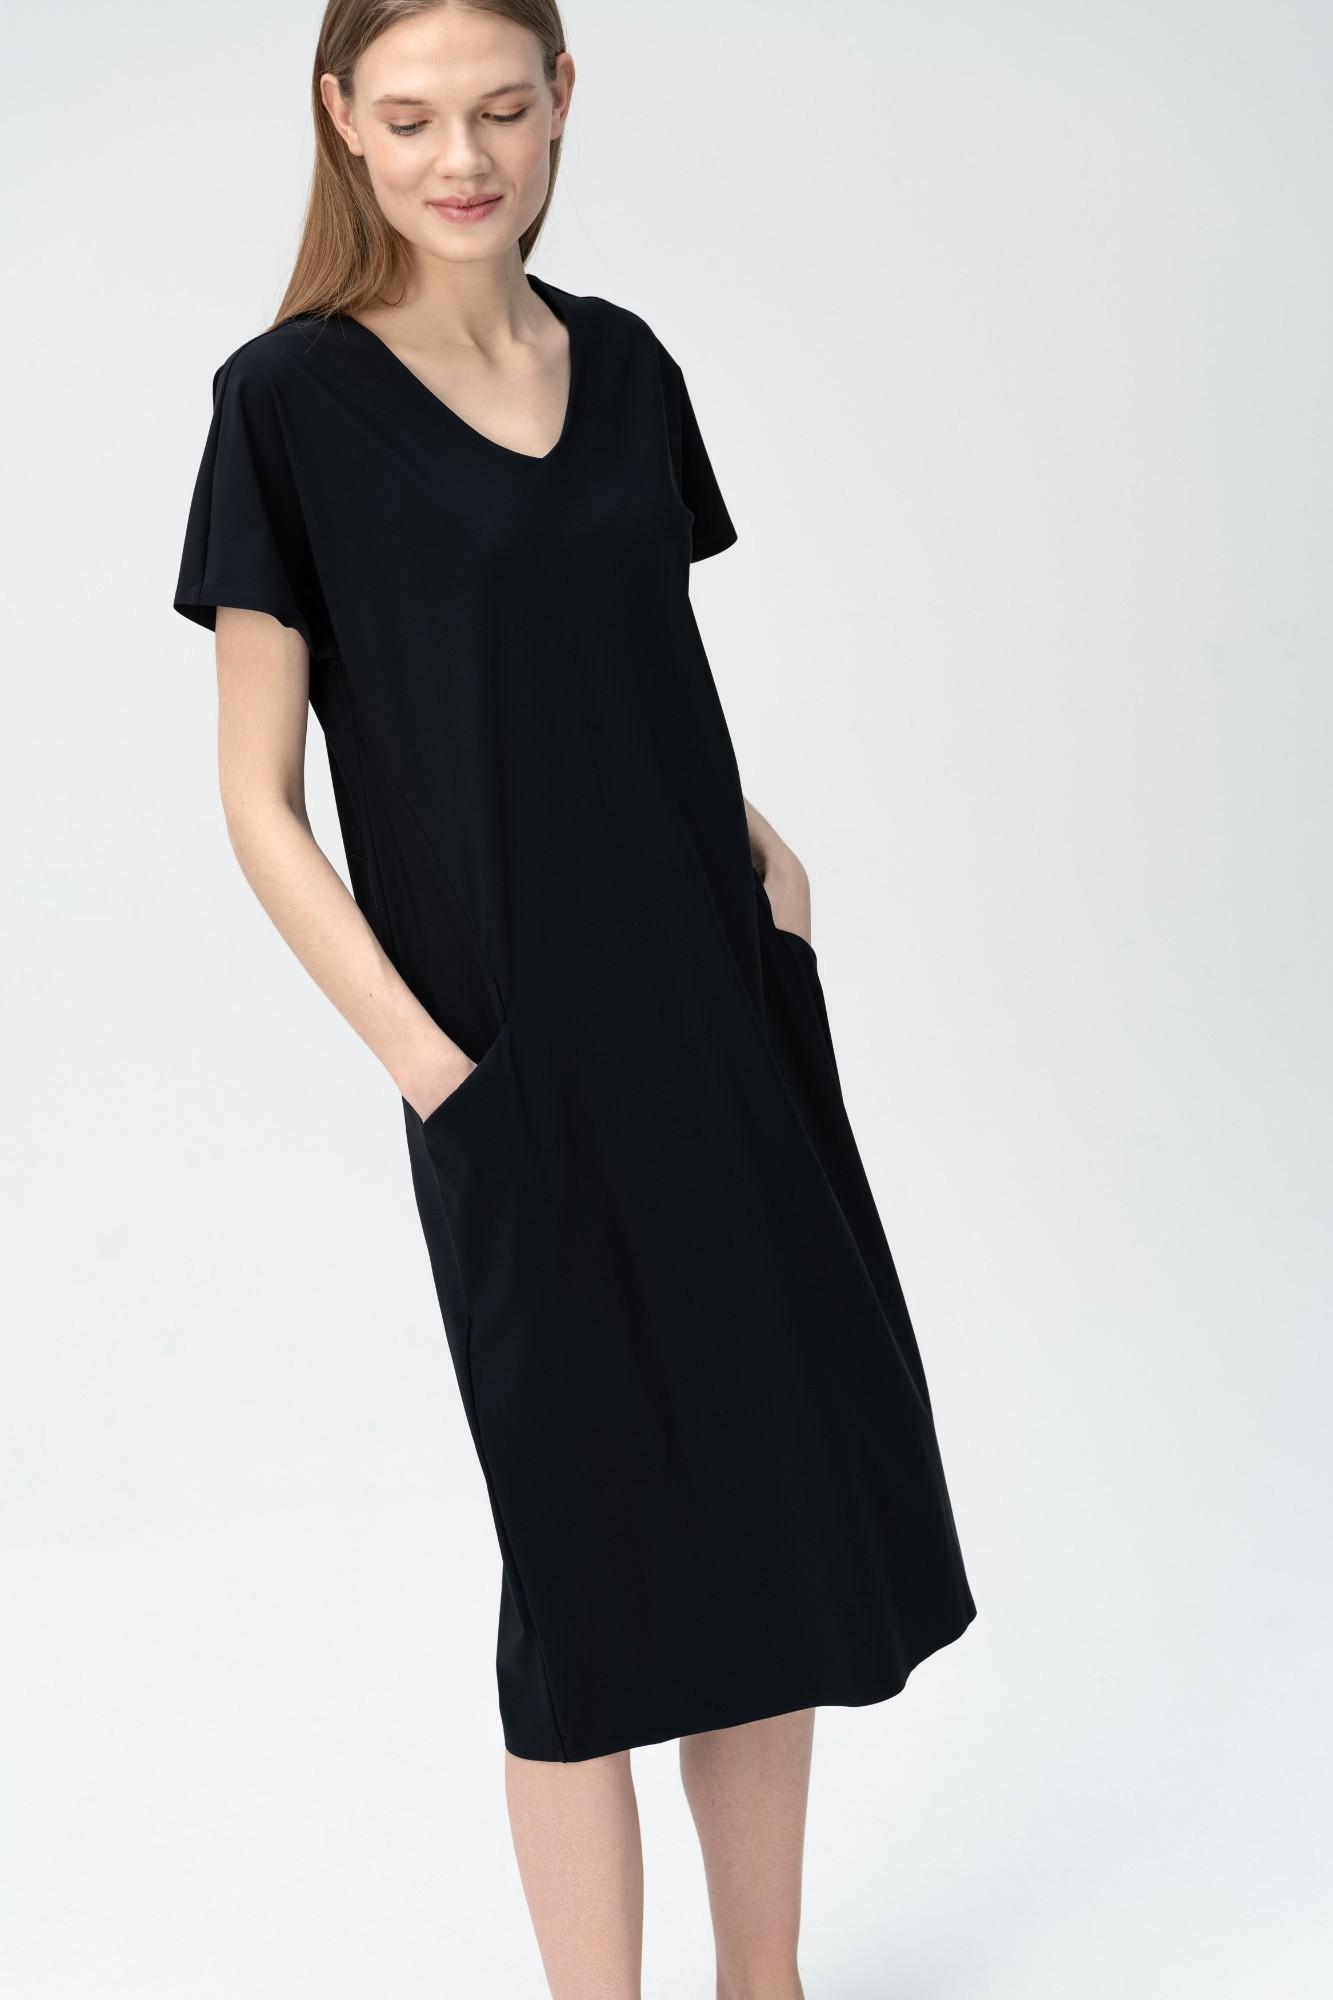 AUDIMAS Lengva suknelė SENSITIVE 2011-183 Black L